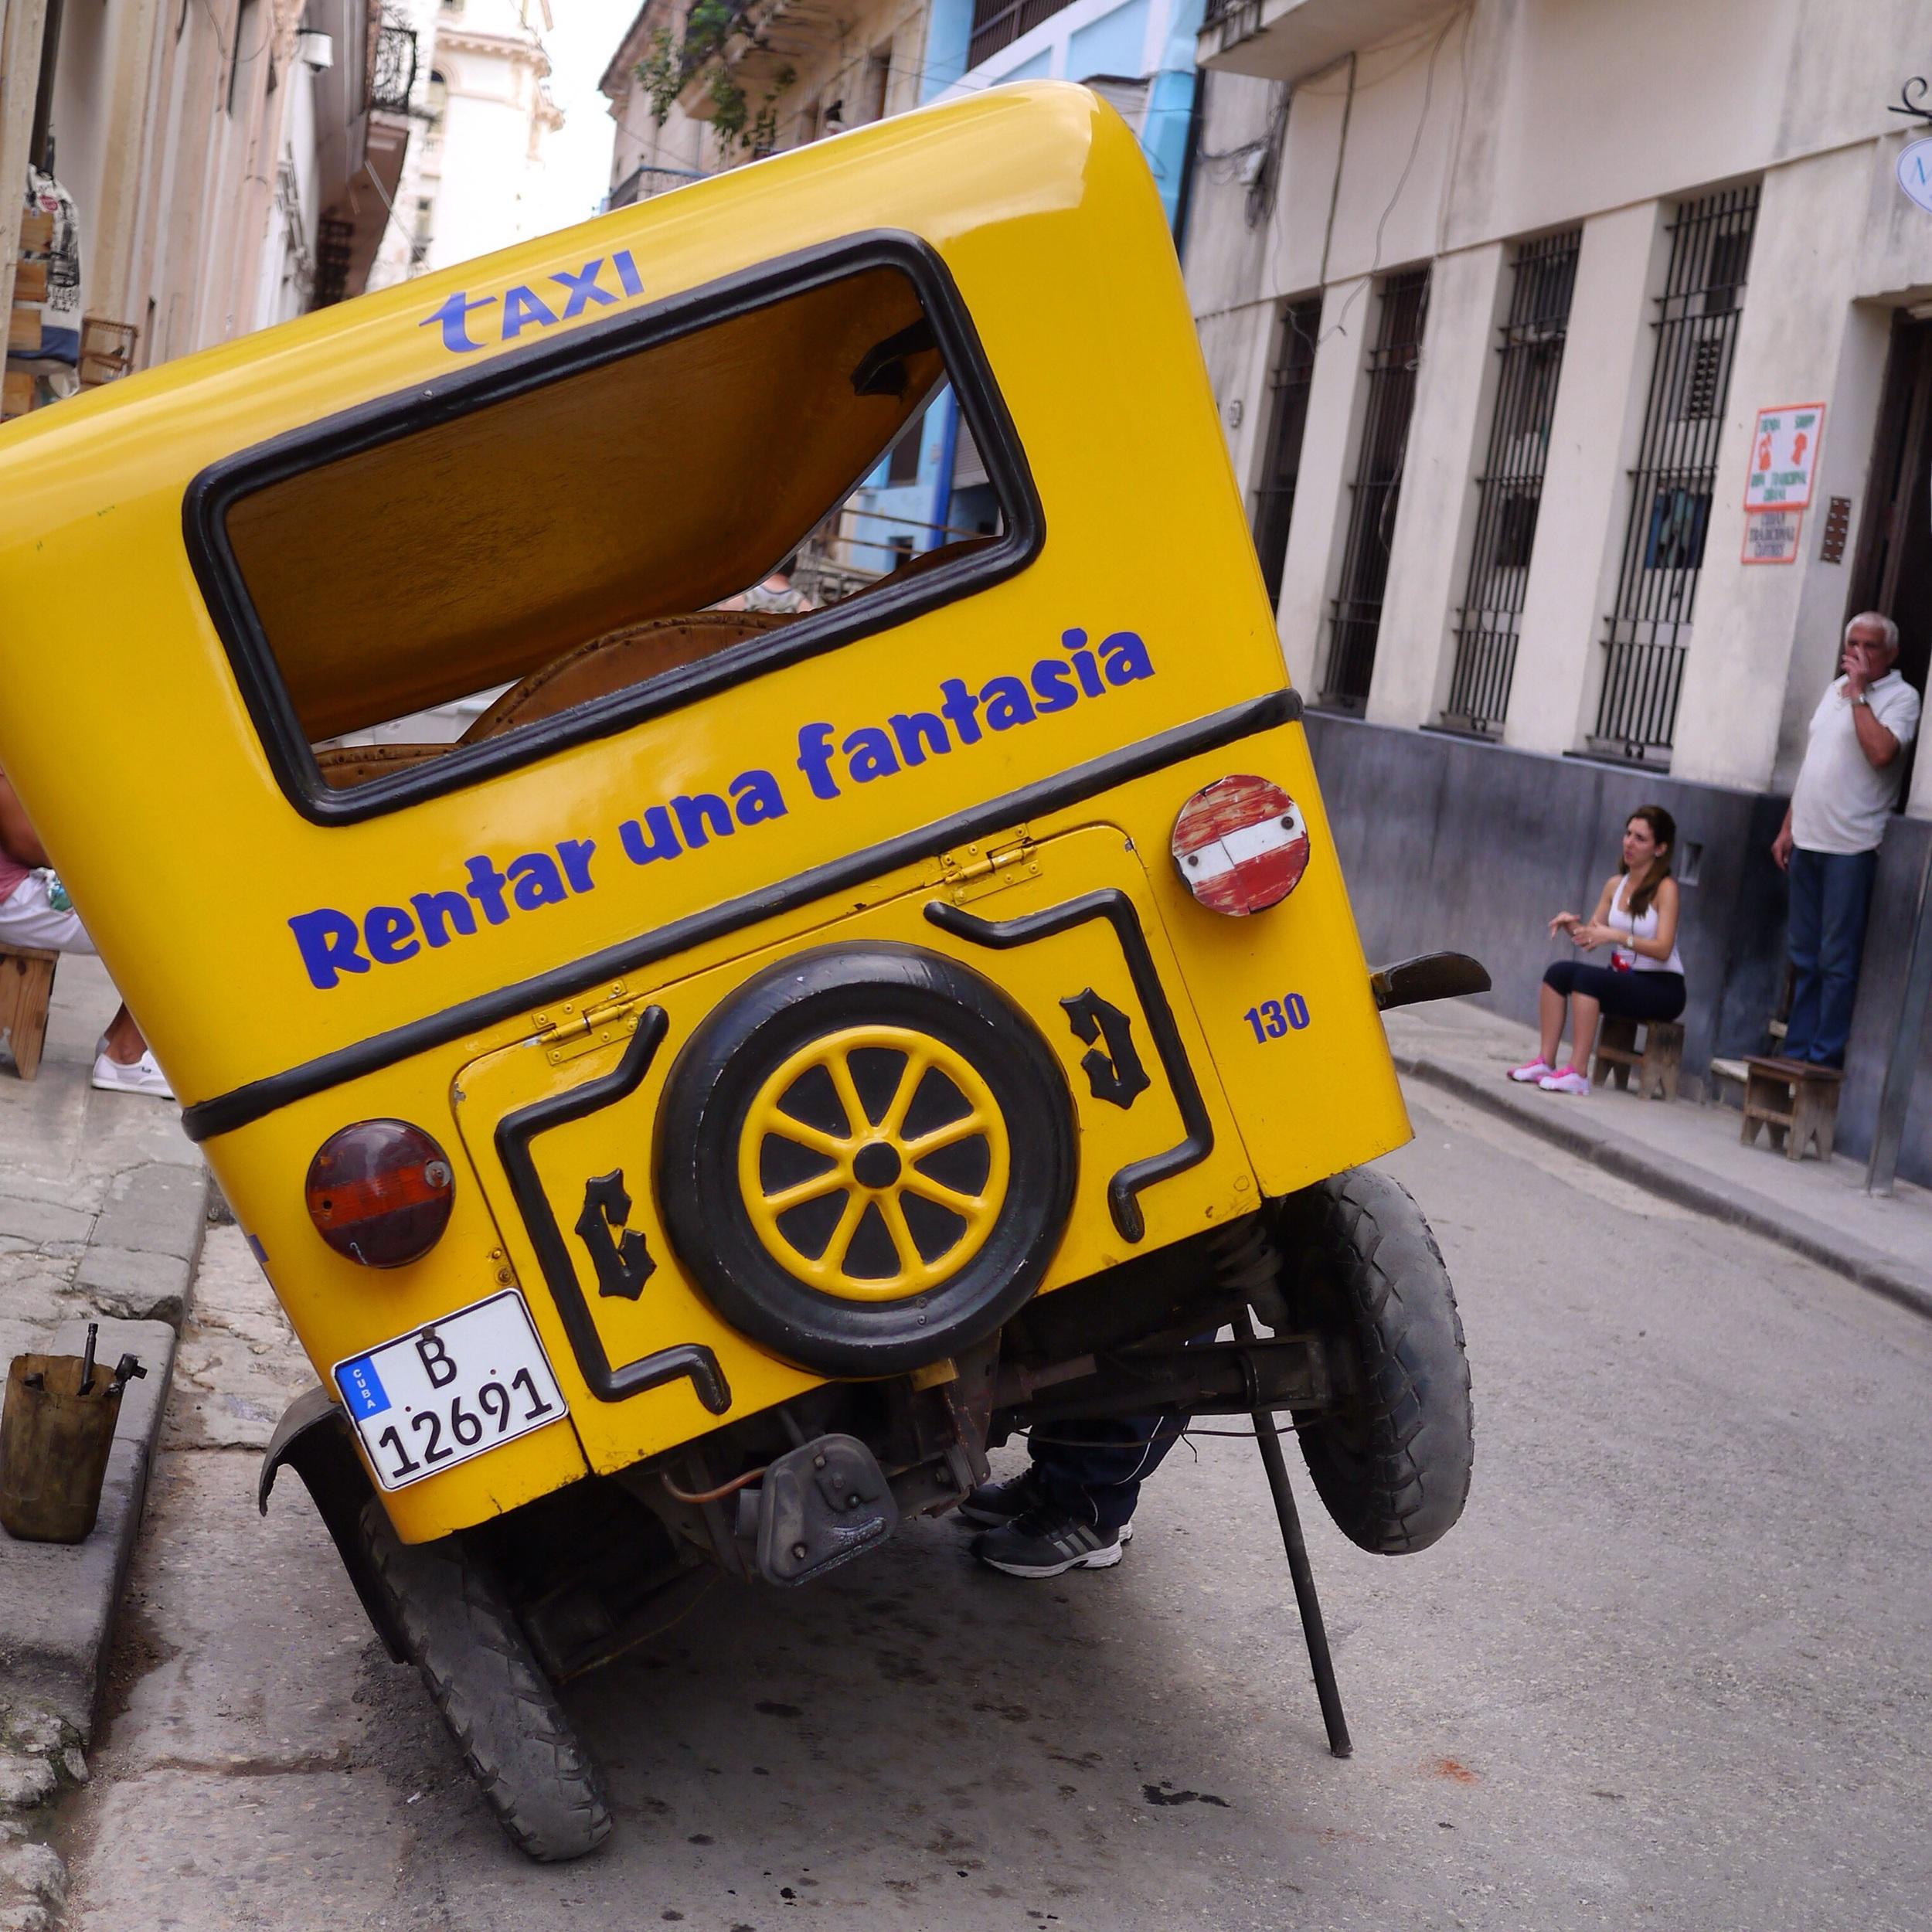 Rent a Fantasy, Old Havana, (2015)